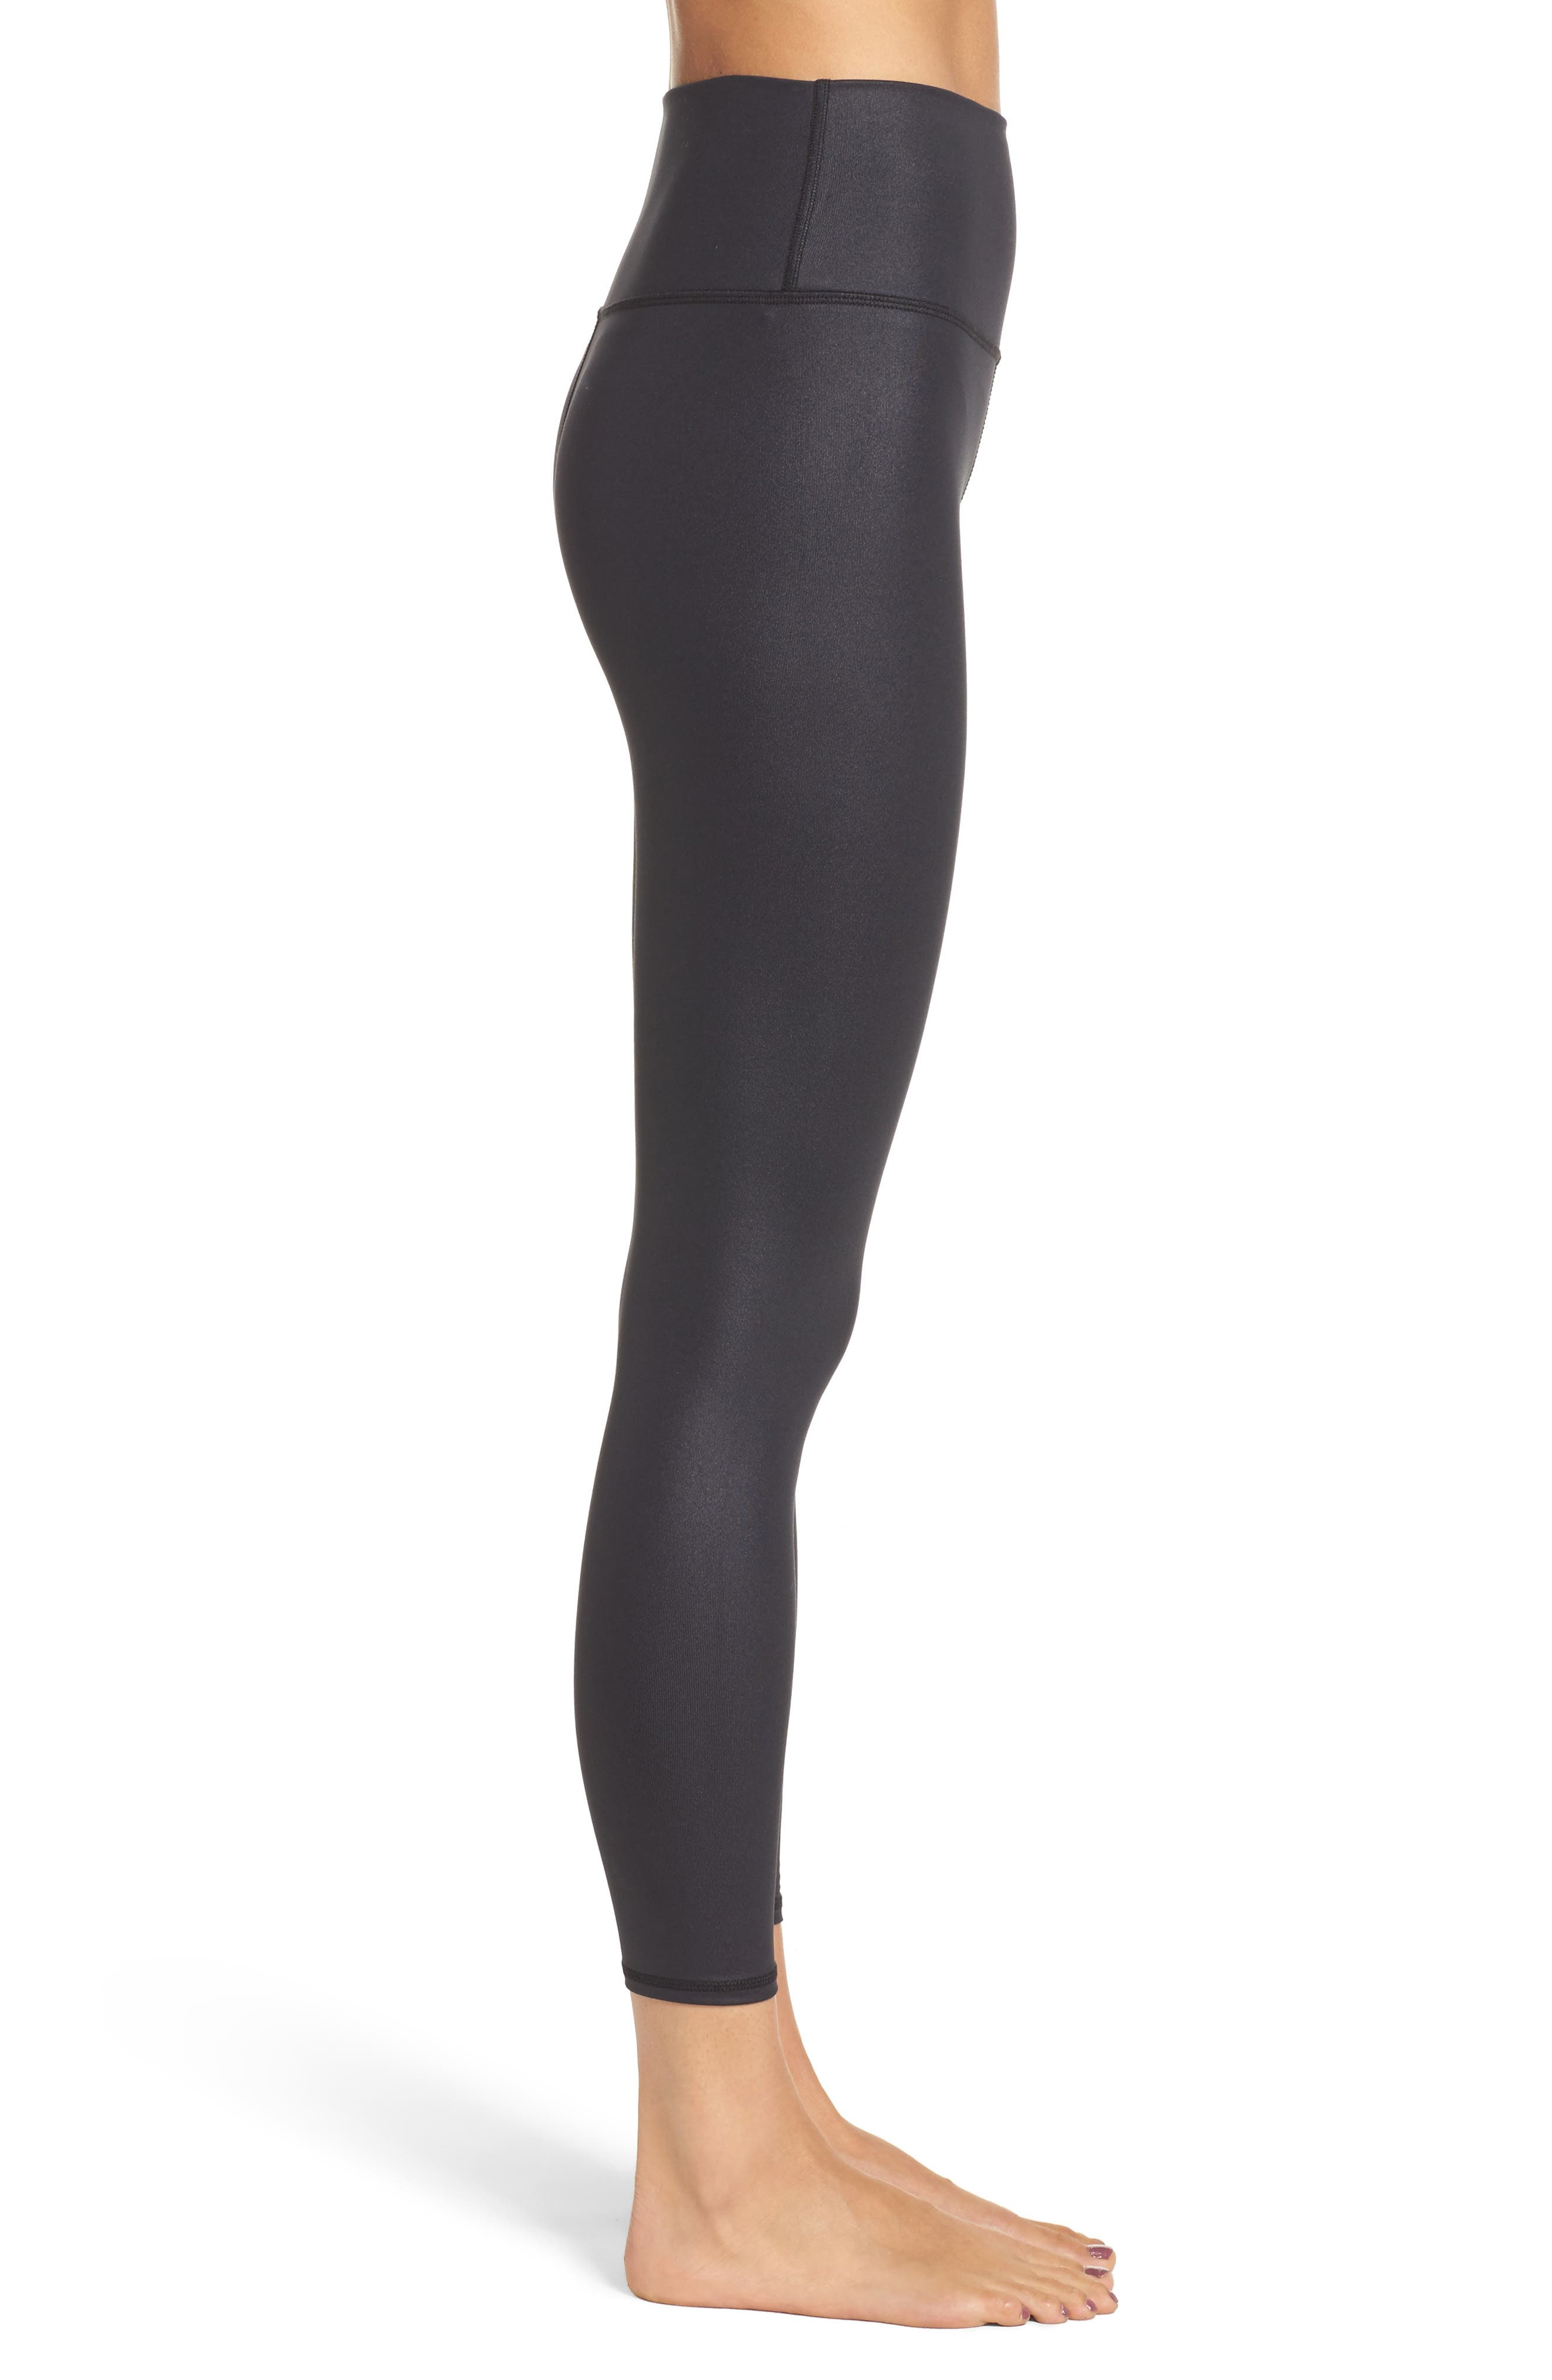 High Waist Airbrush Midi Leggings,                             Alternate thumbnail 3, color,                             BLACK GLOSSY